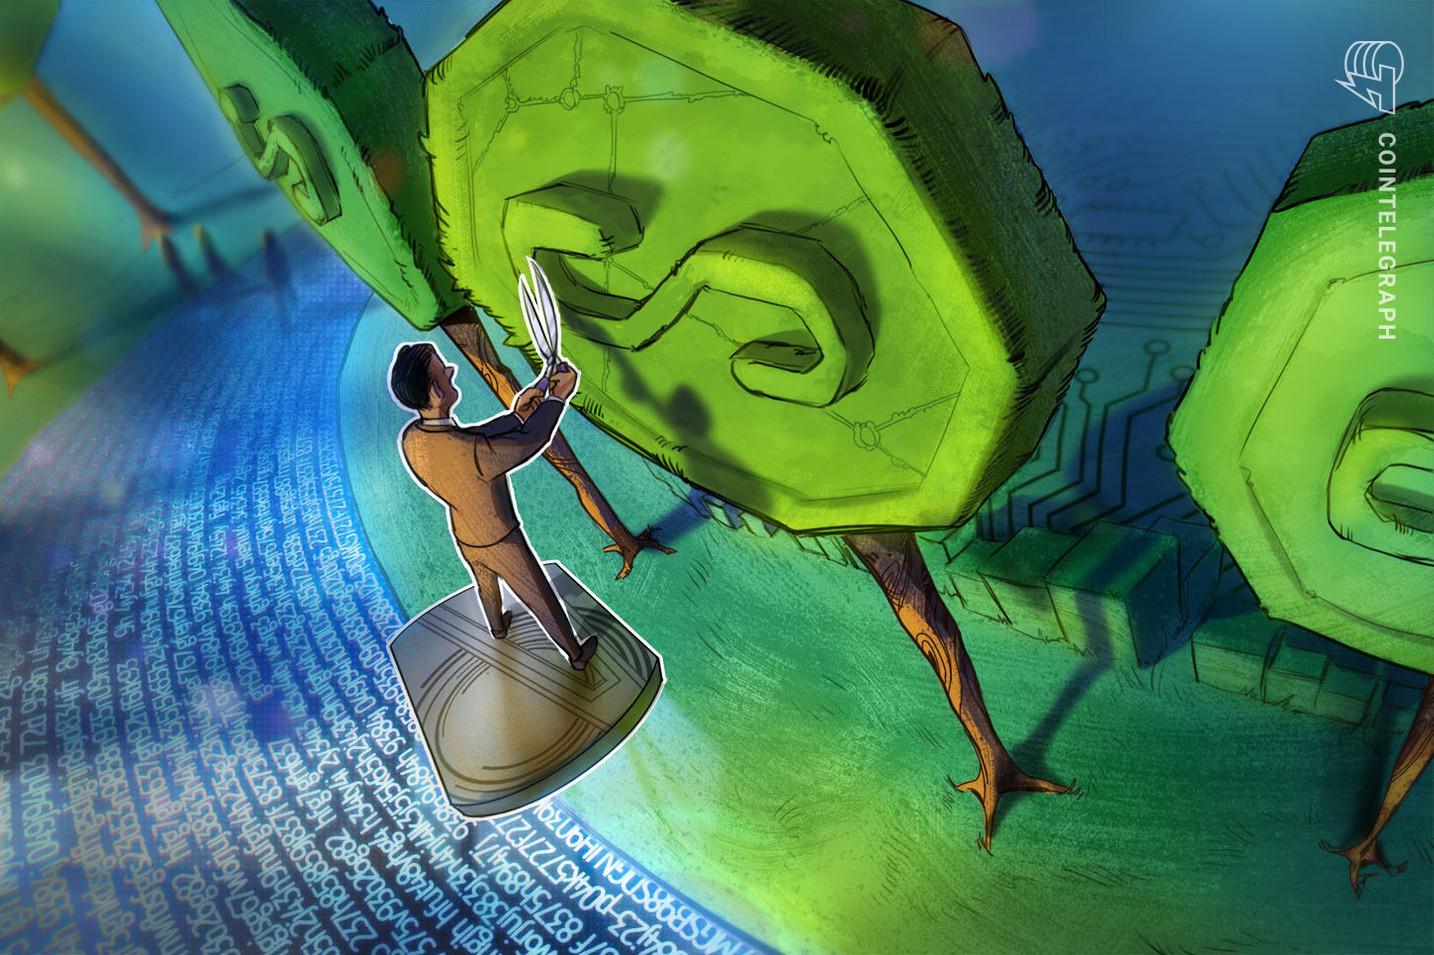 Desde Bitbase, en España, opinaron que la inversión en criptomonedas debe ser para uso personal